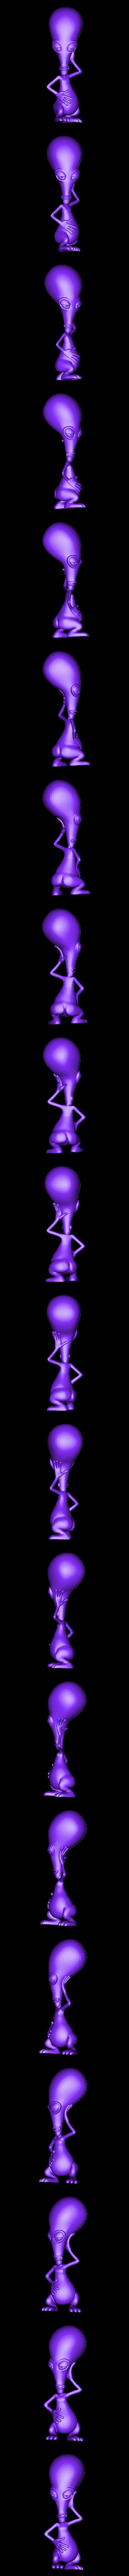 rogerPose3_rep.stl Download free STL file Alien Figurine (Roger) • 3D print template, mooses